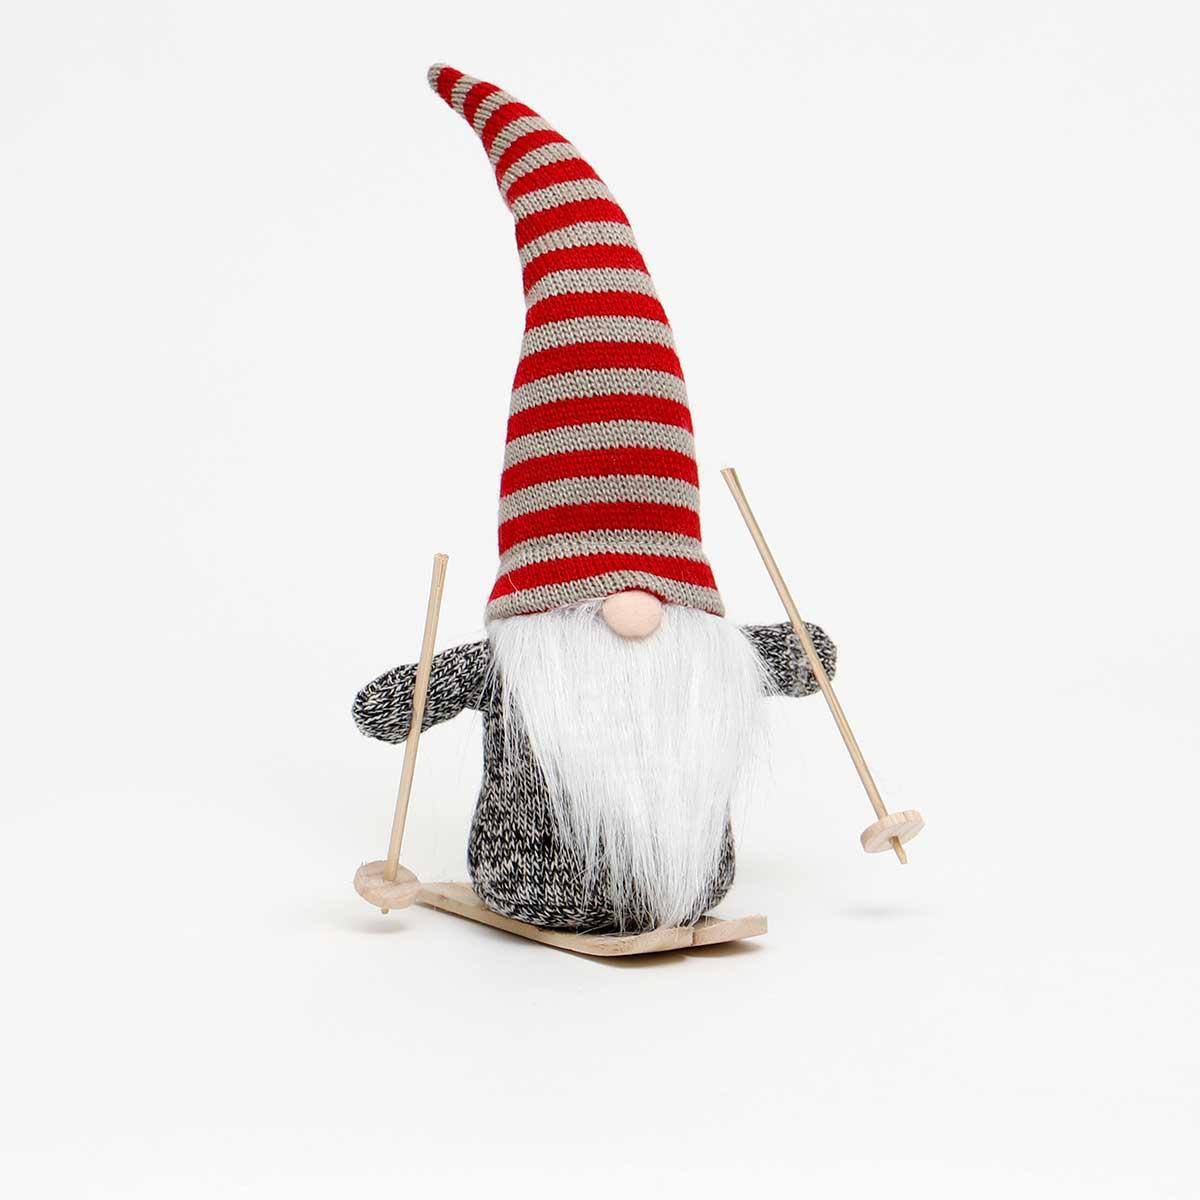 KRIS GNOME WITH RED/WHITE STRIPE